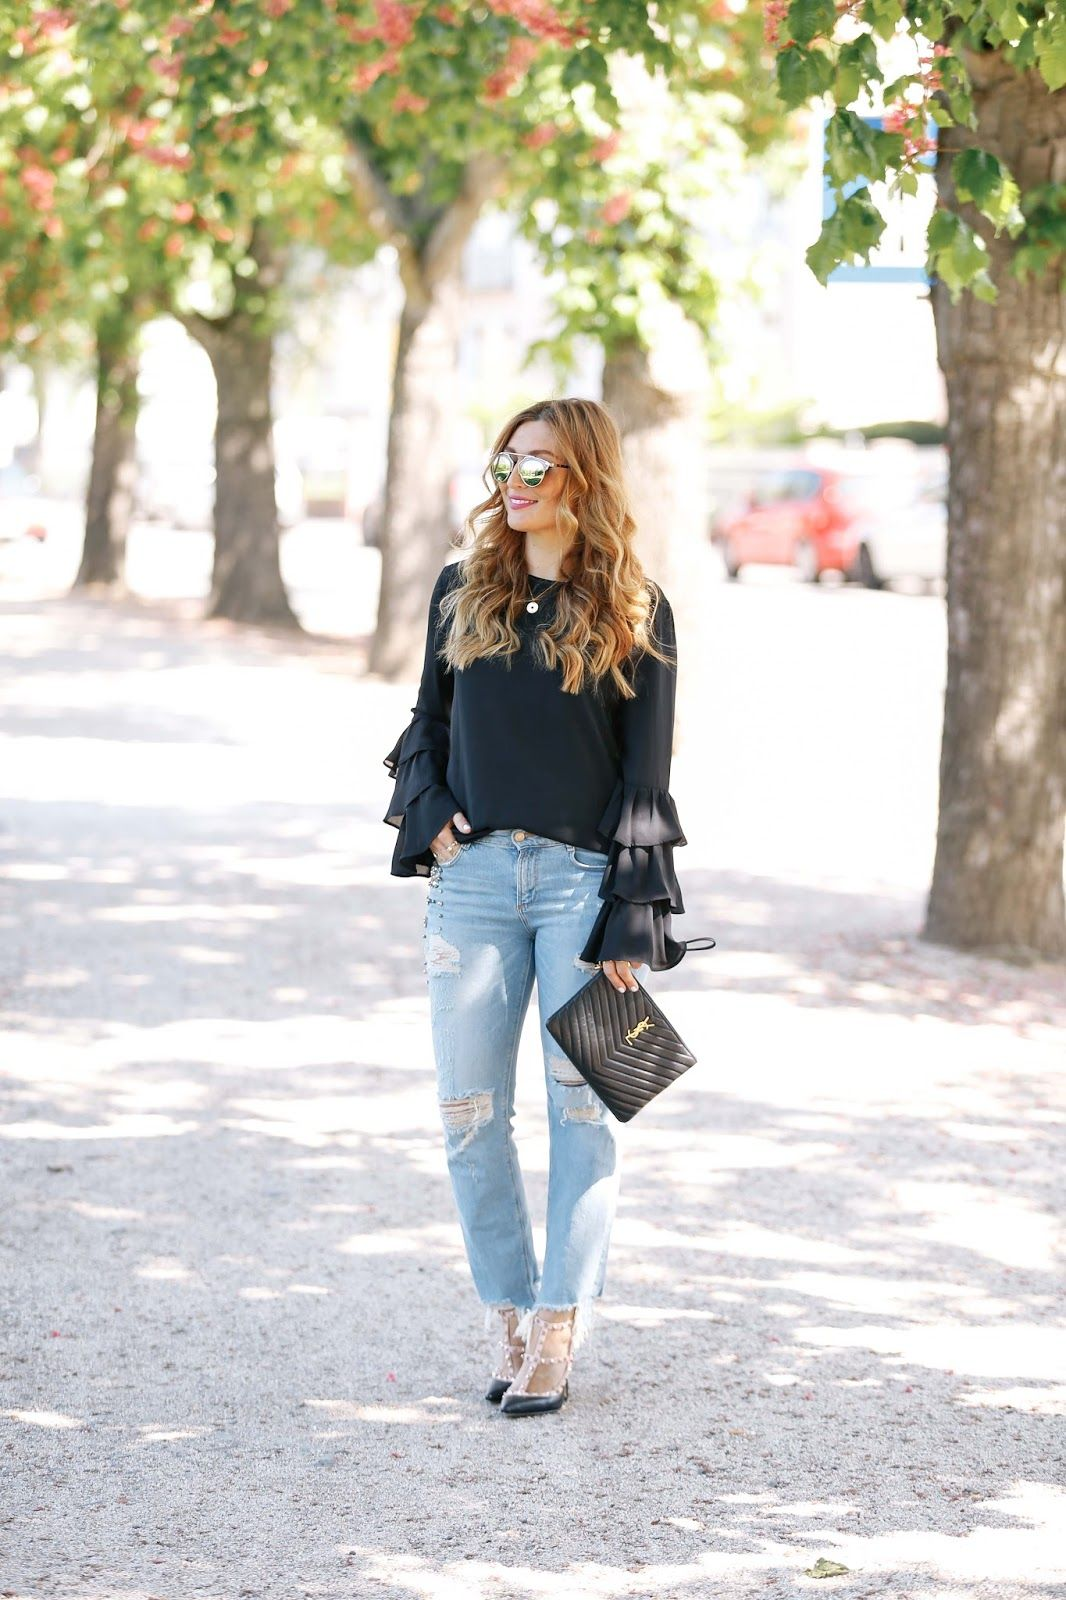 Top Neue Bluse in Volant-Ärmel   Fashionstylebyjohanna @YH_85